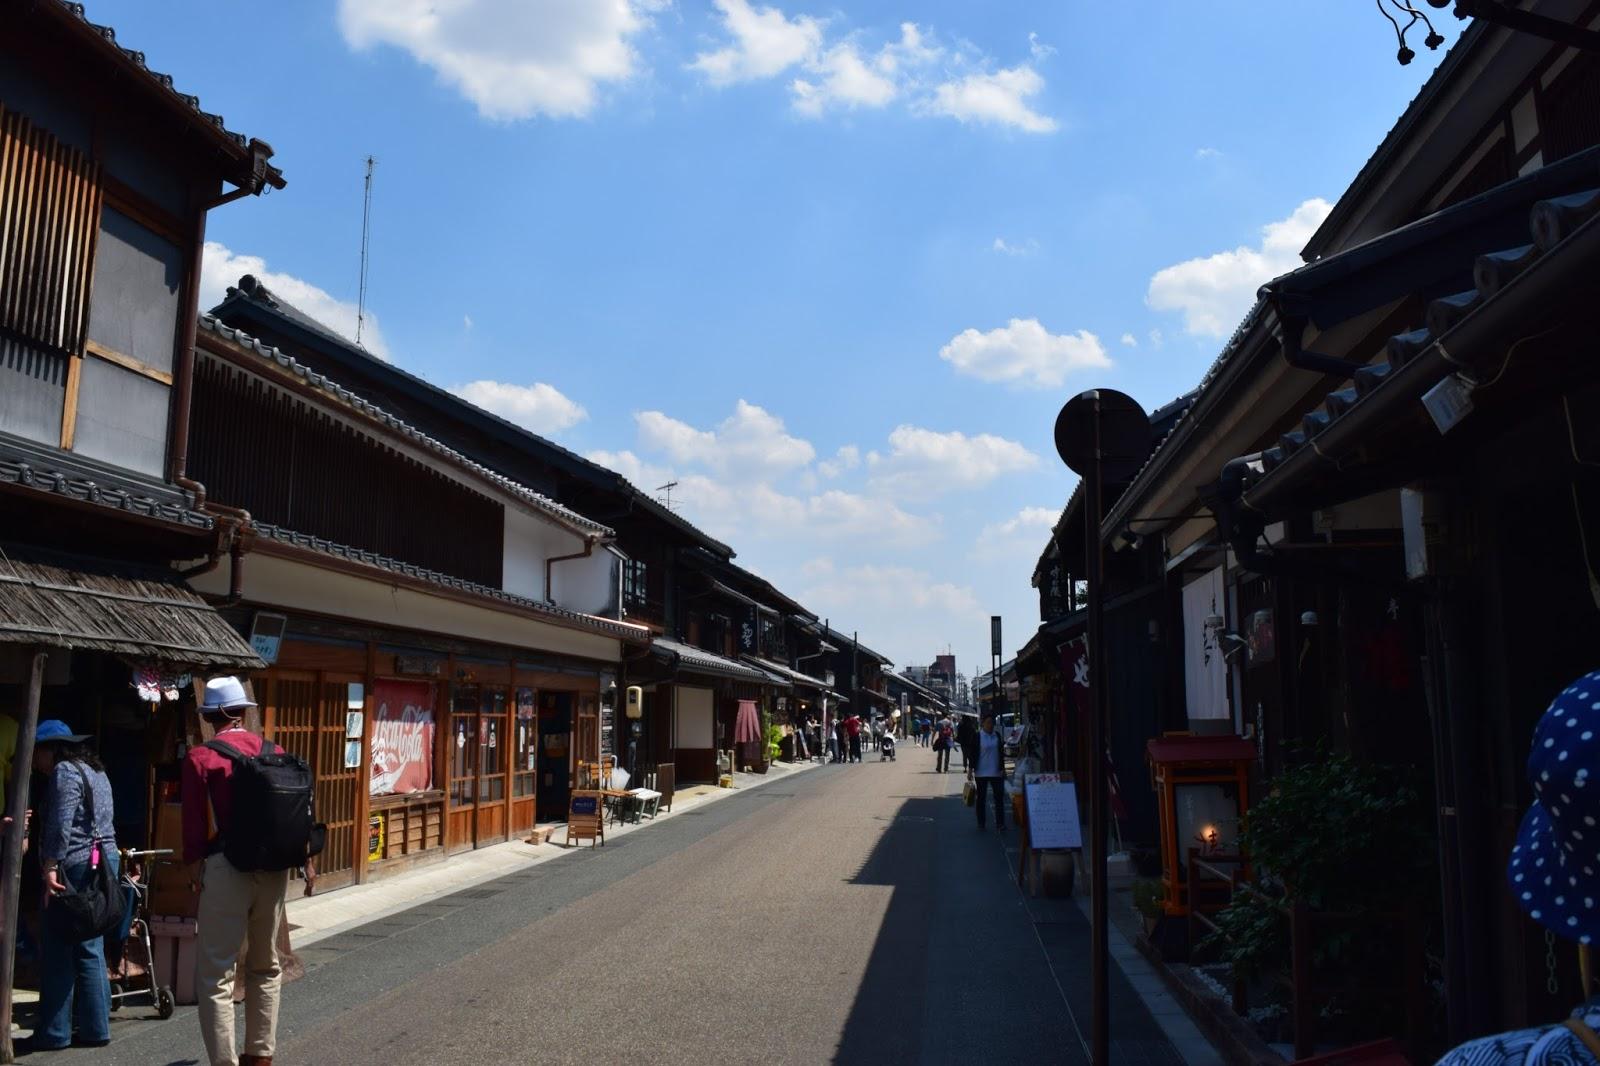 Inuyama castle area Aichi